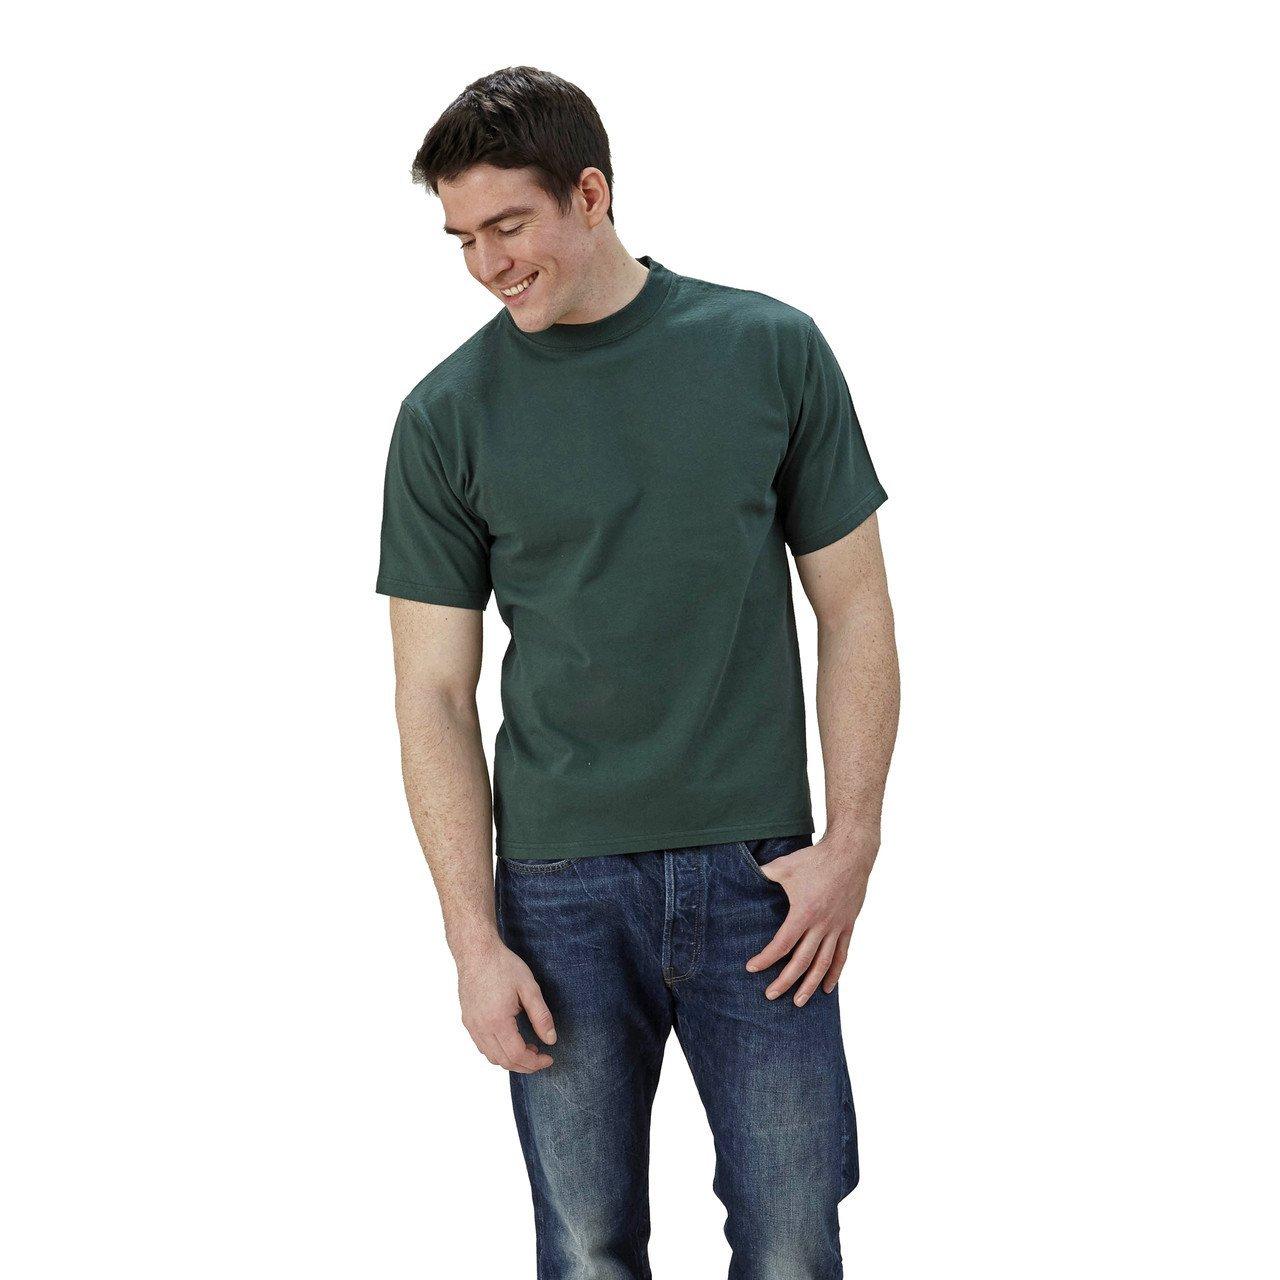 Goodwear Adult Short Sleeve Crew Neck Classic Fit